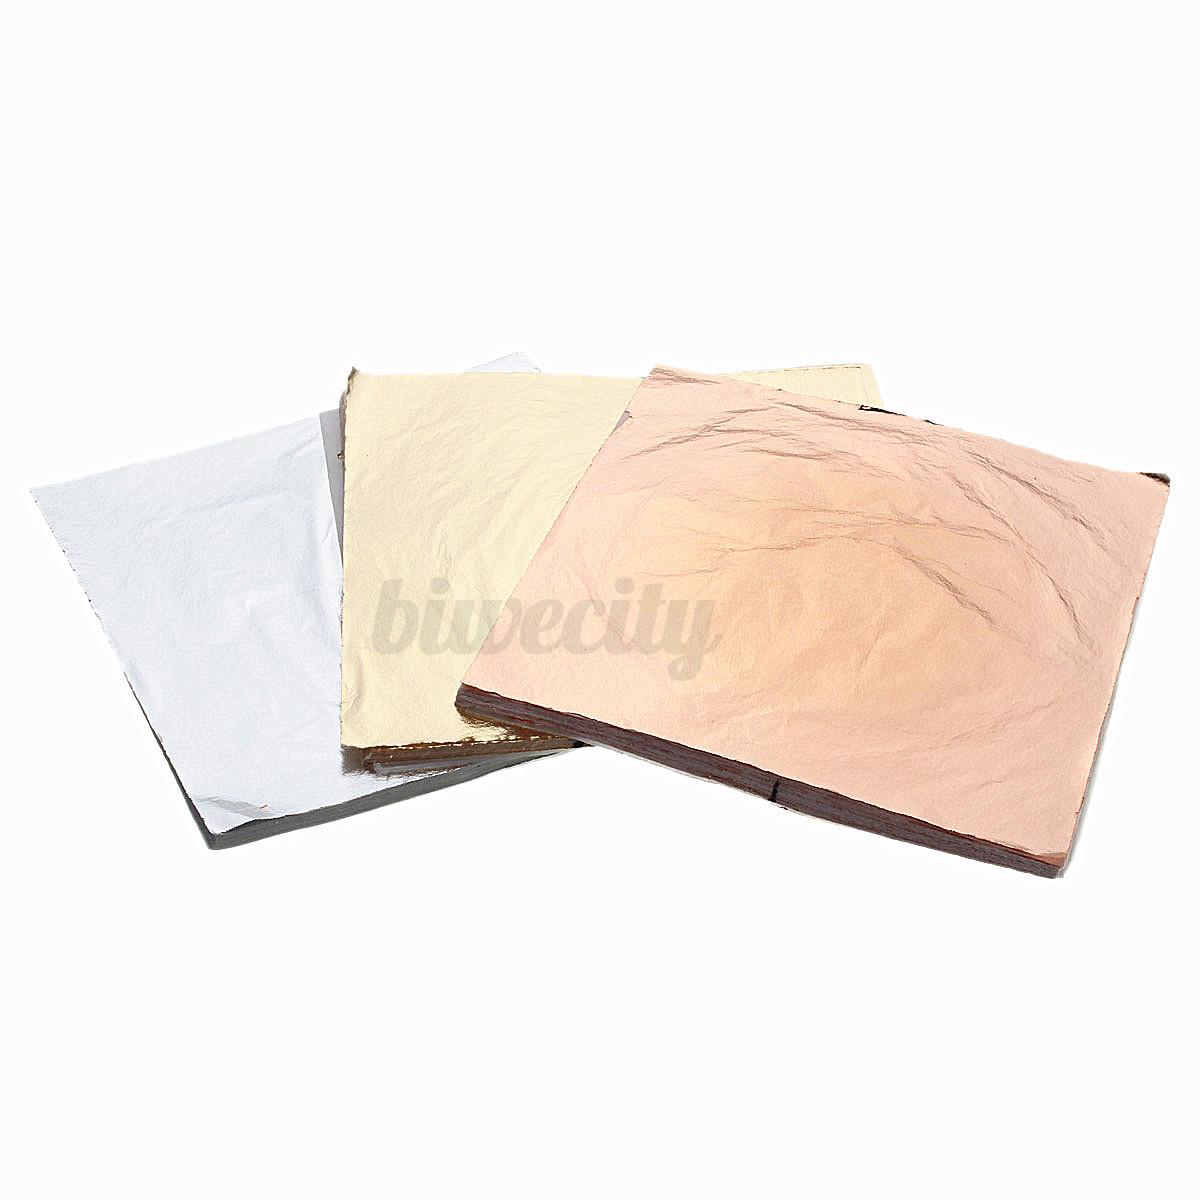 100 200 400 sheets gold silver copper leaf foil paper for Silver foil paper craft